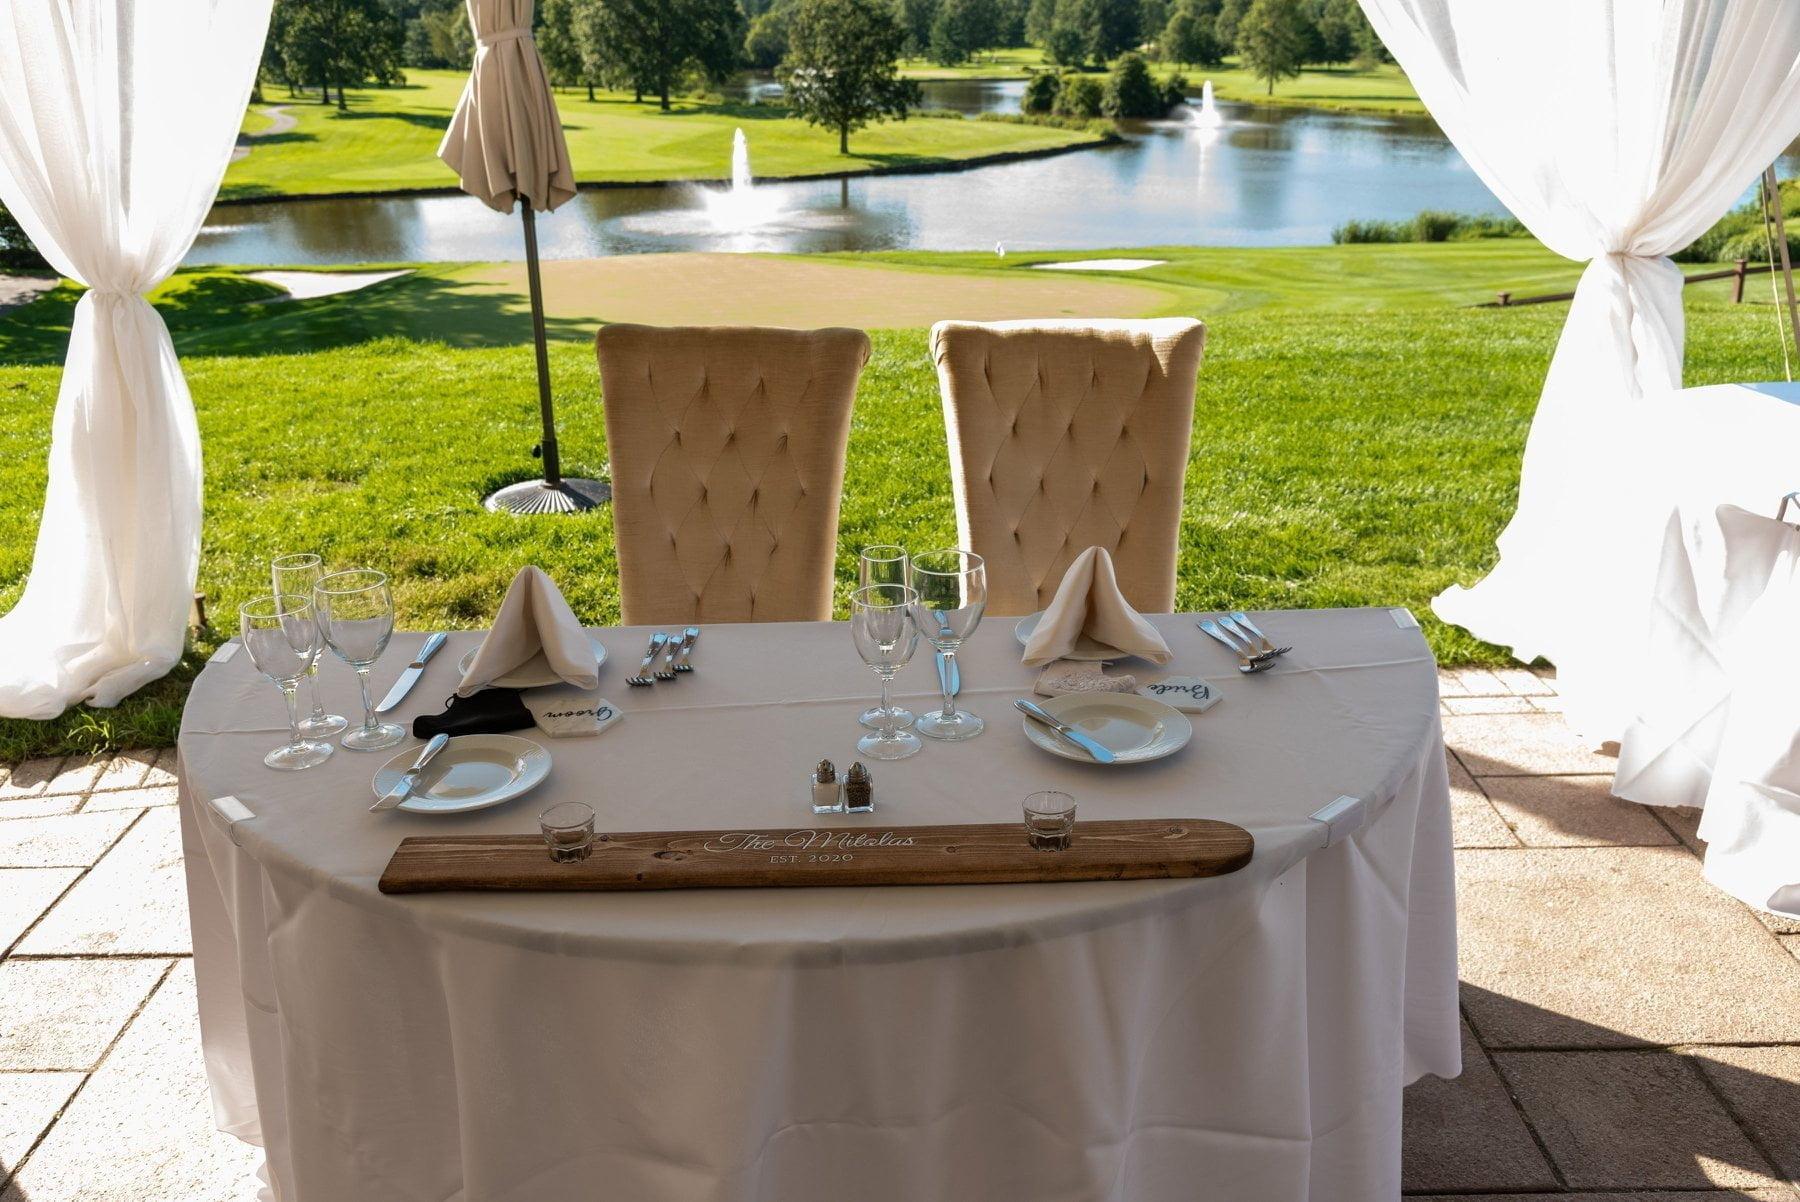 Bride and groom table at outdoor wedding Morris County venue, Brooklake, Northern NJ